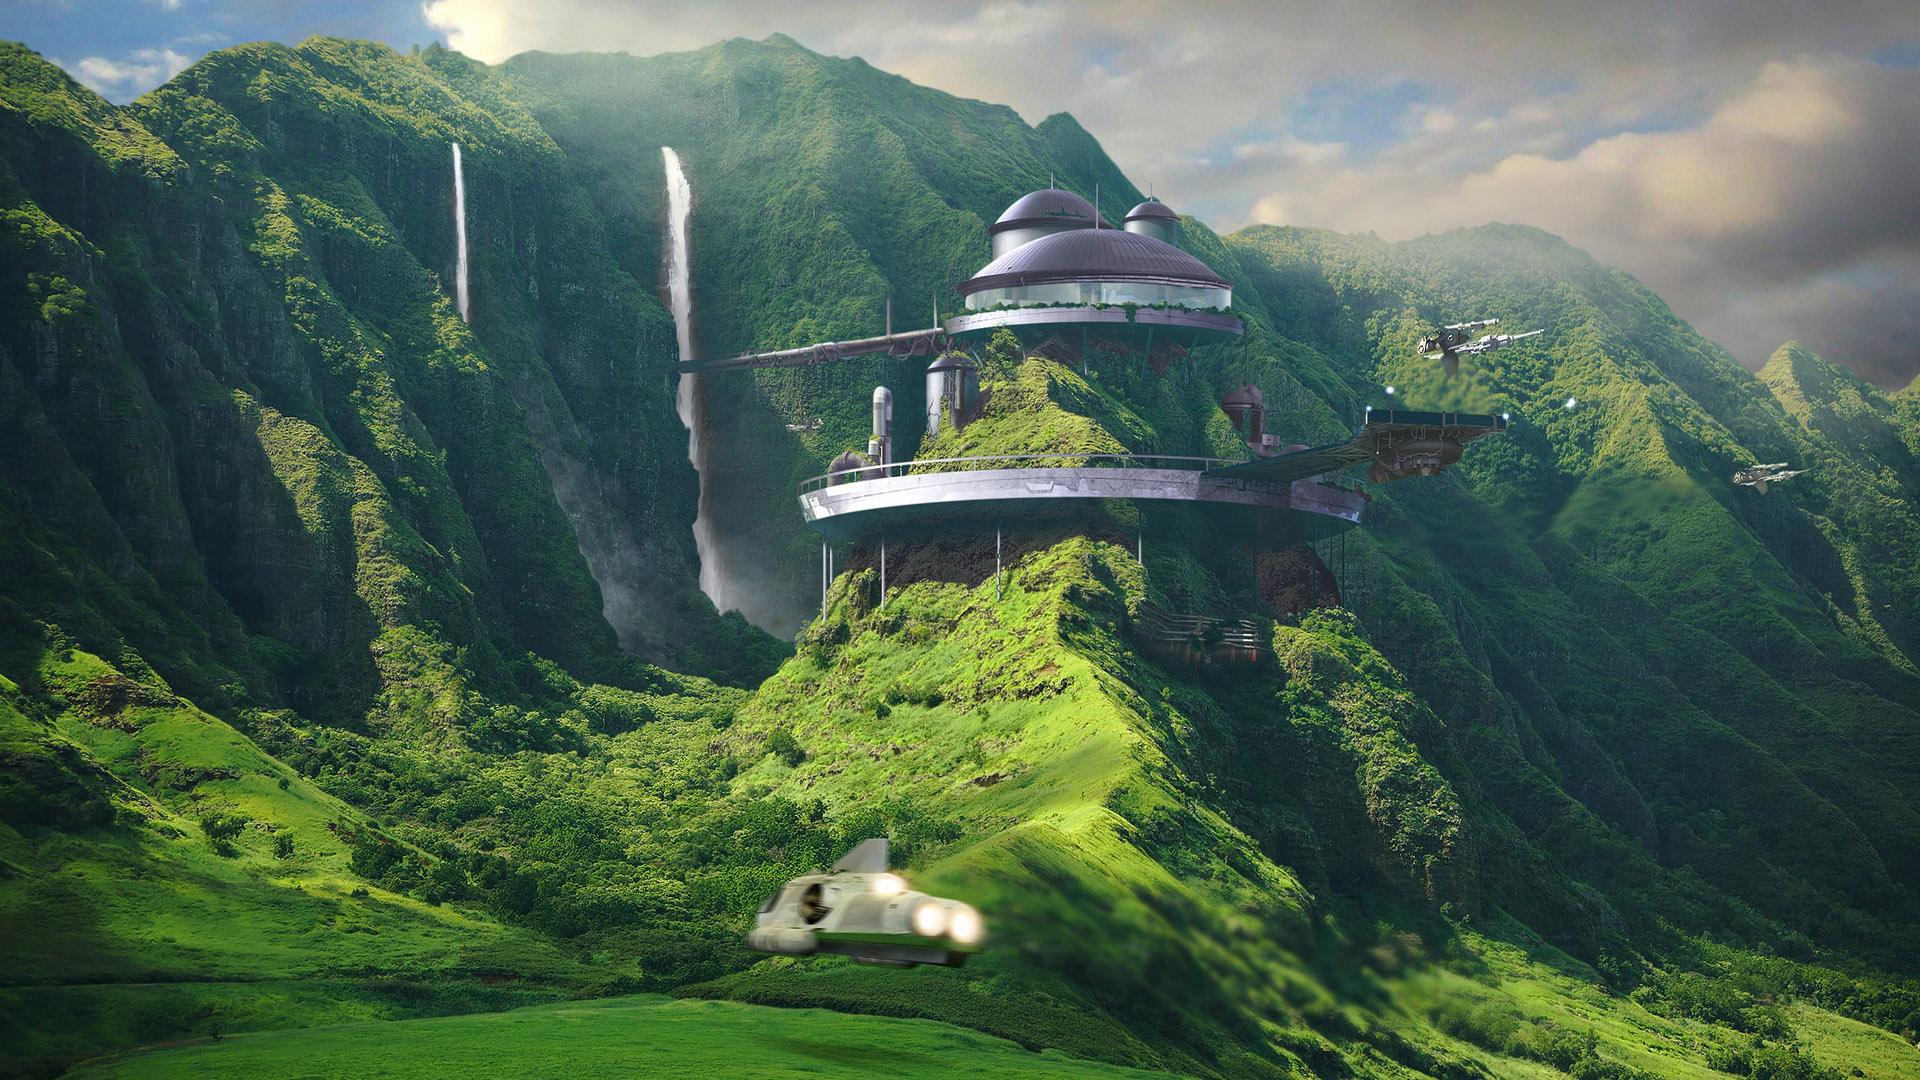 ... Sci Fi Landscape Wallpaper HD 10 High Resolution Wallpaper Full Size